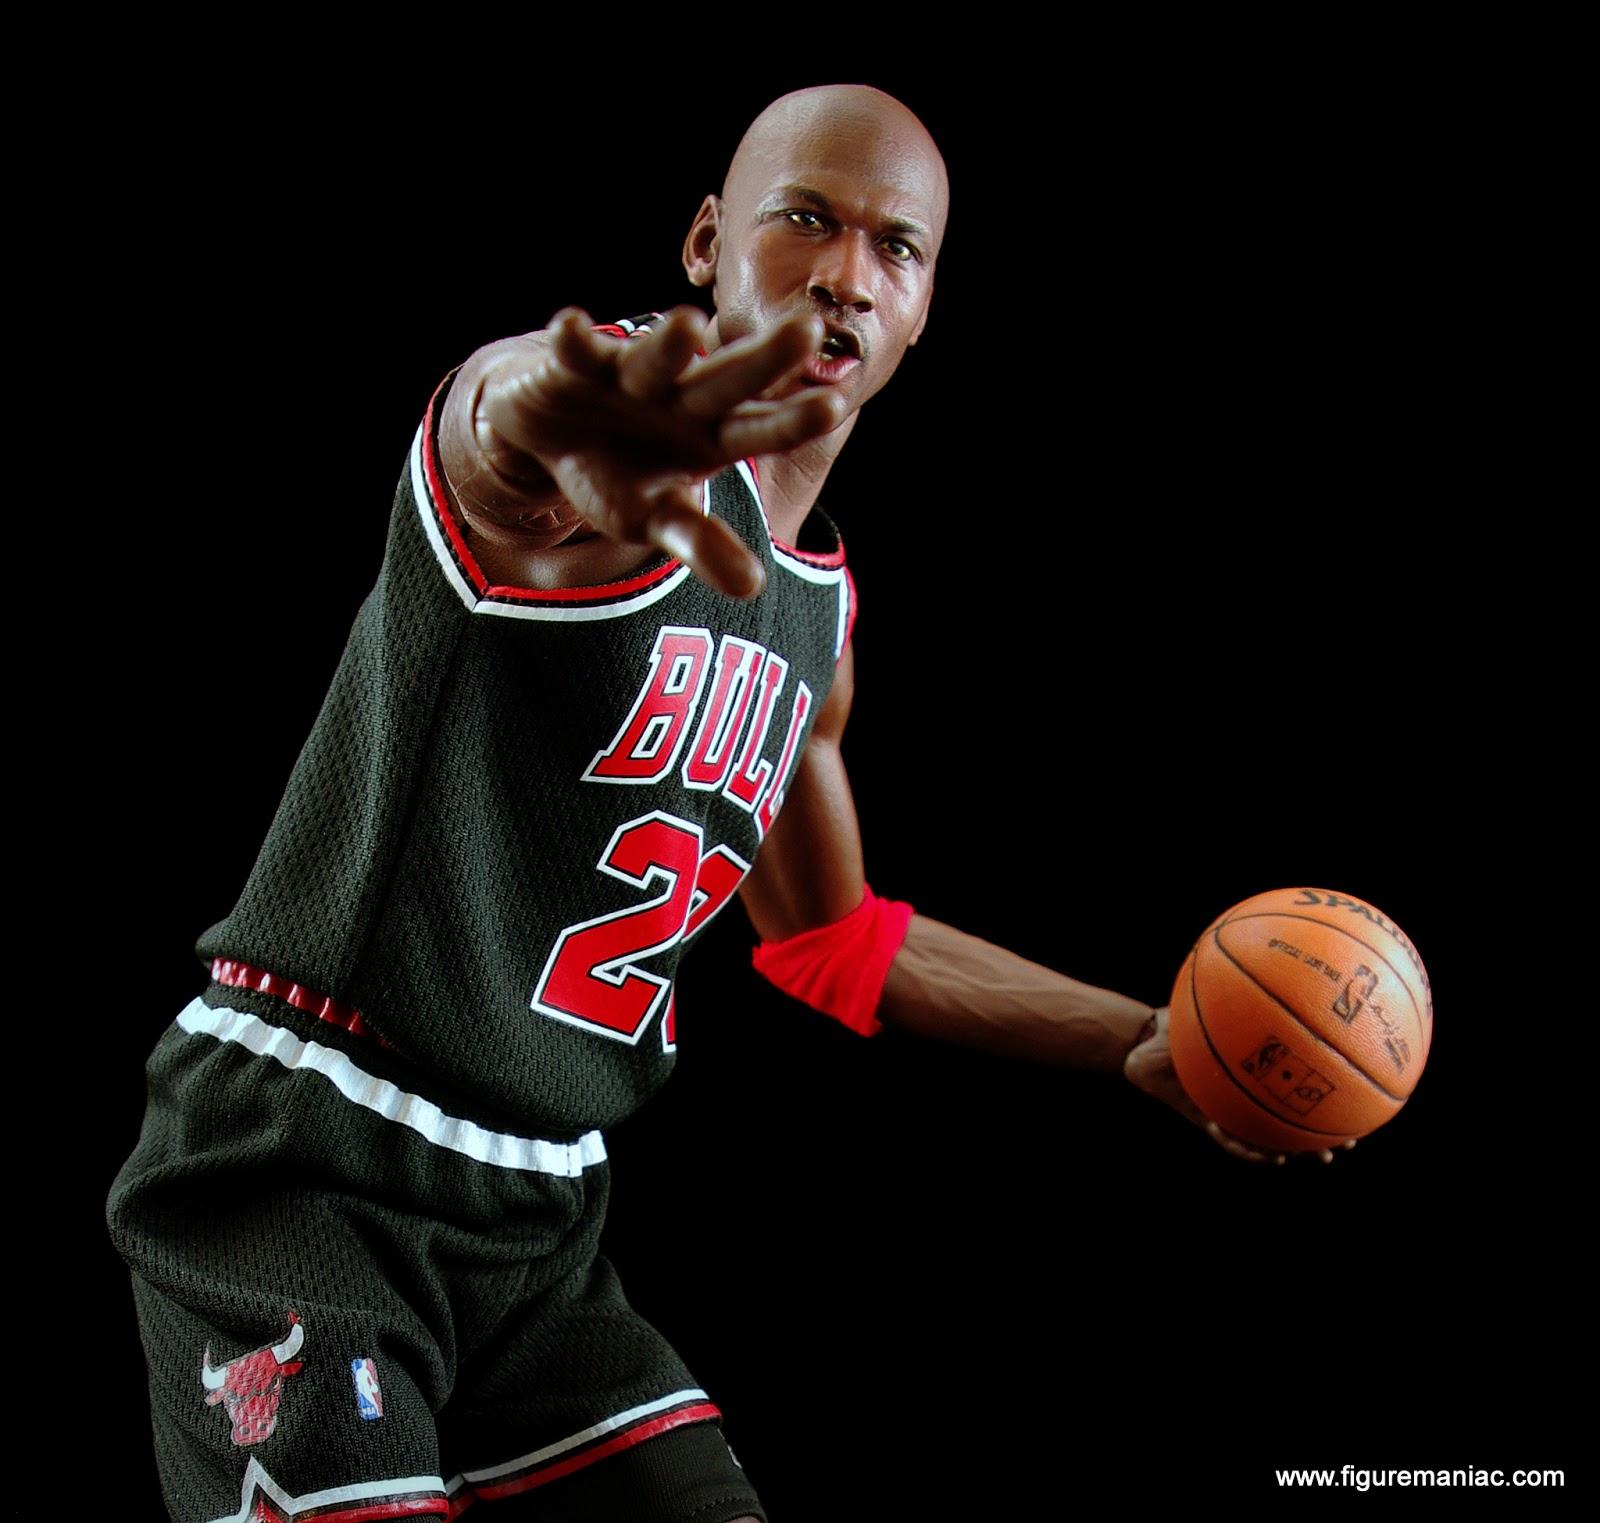 Enterbay - Michael Jordan Series 2 The Last Shot (Part 3)